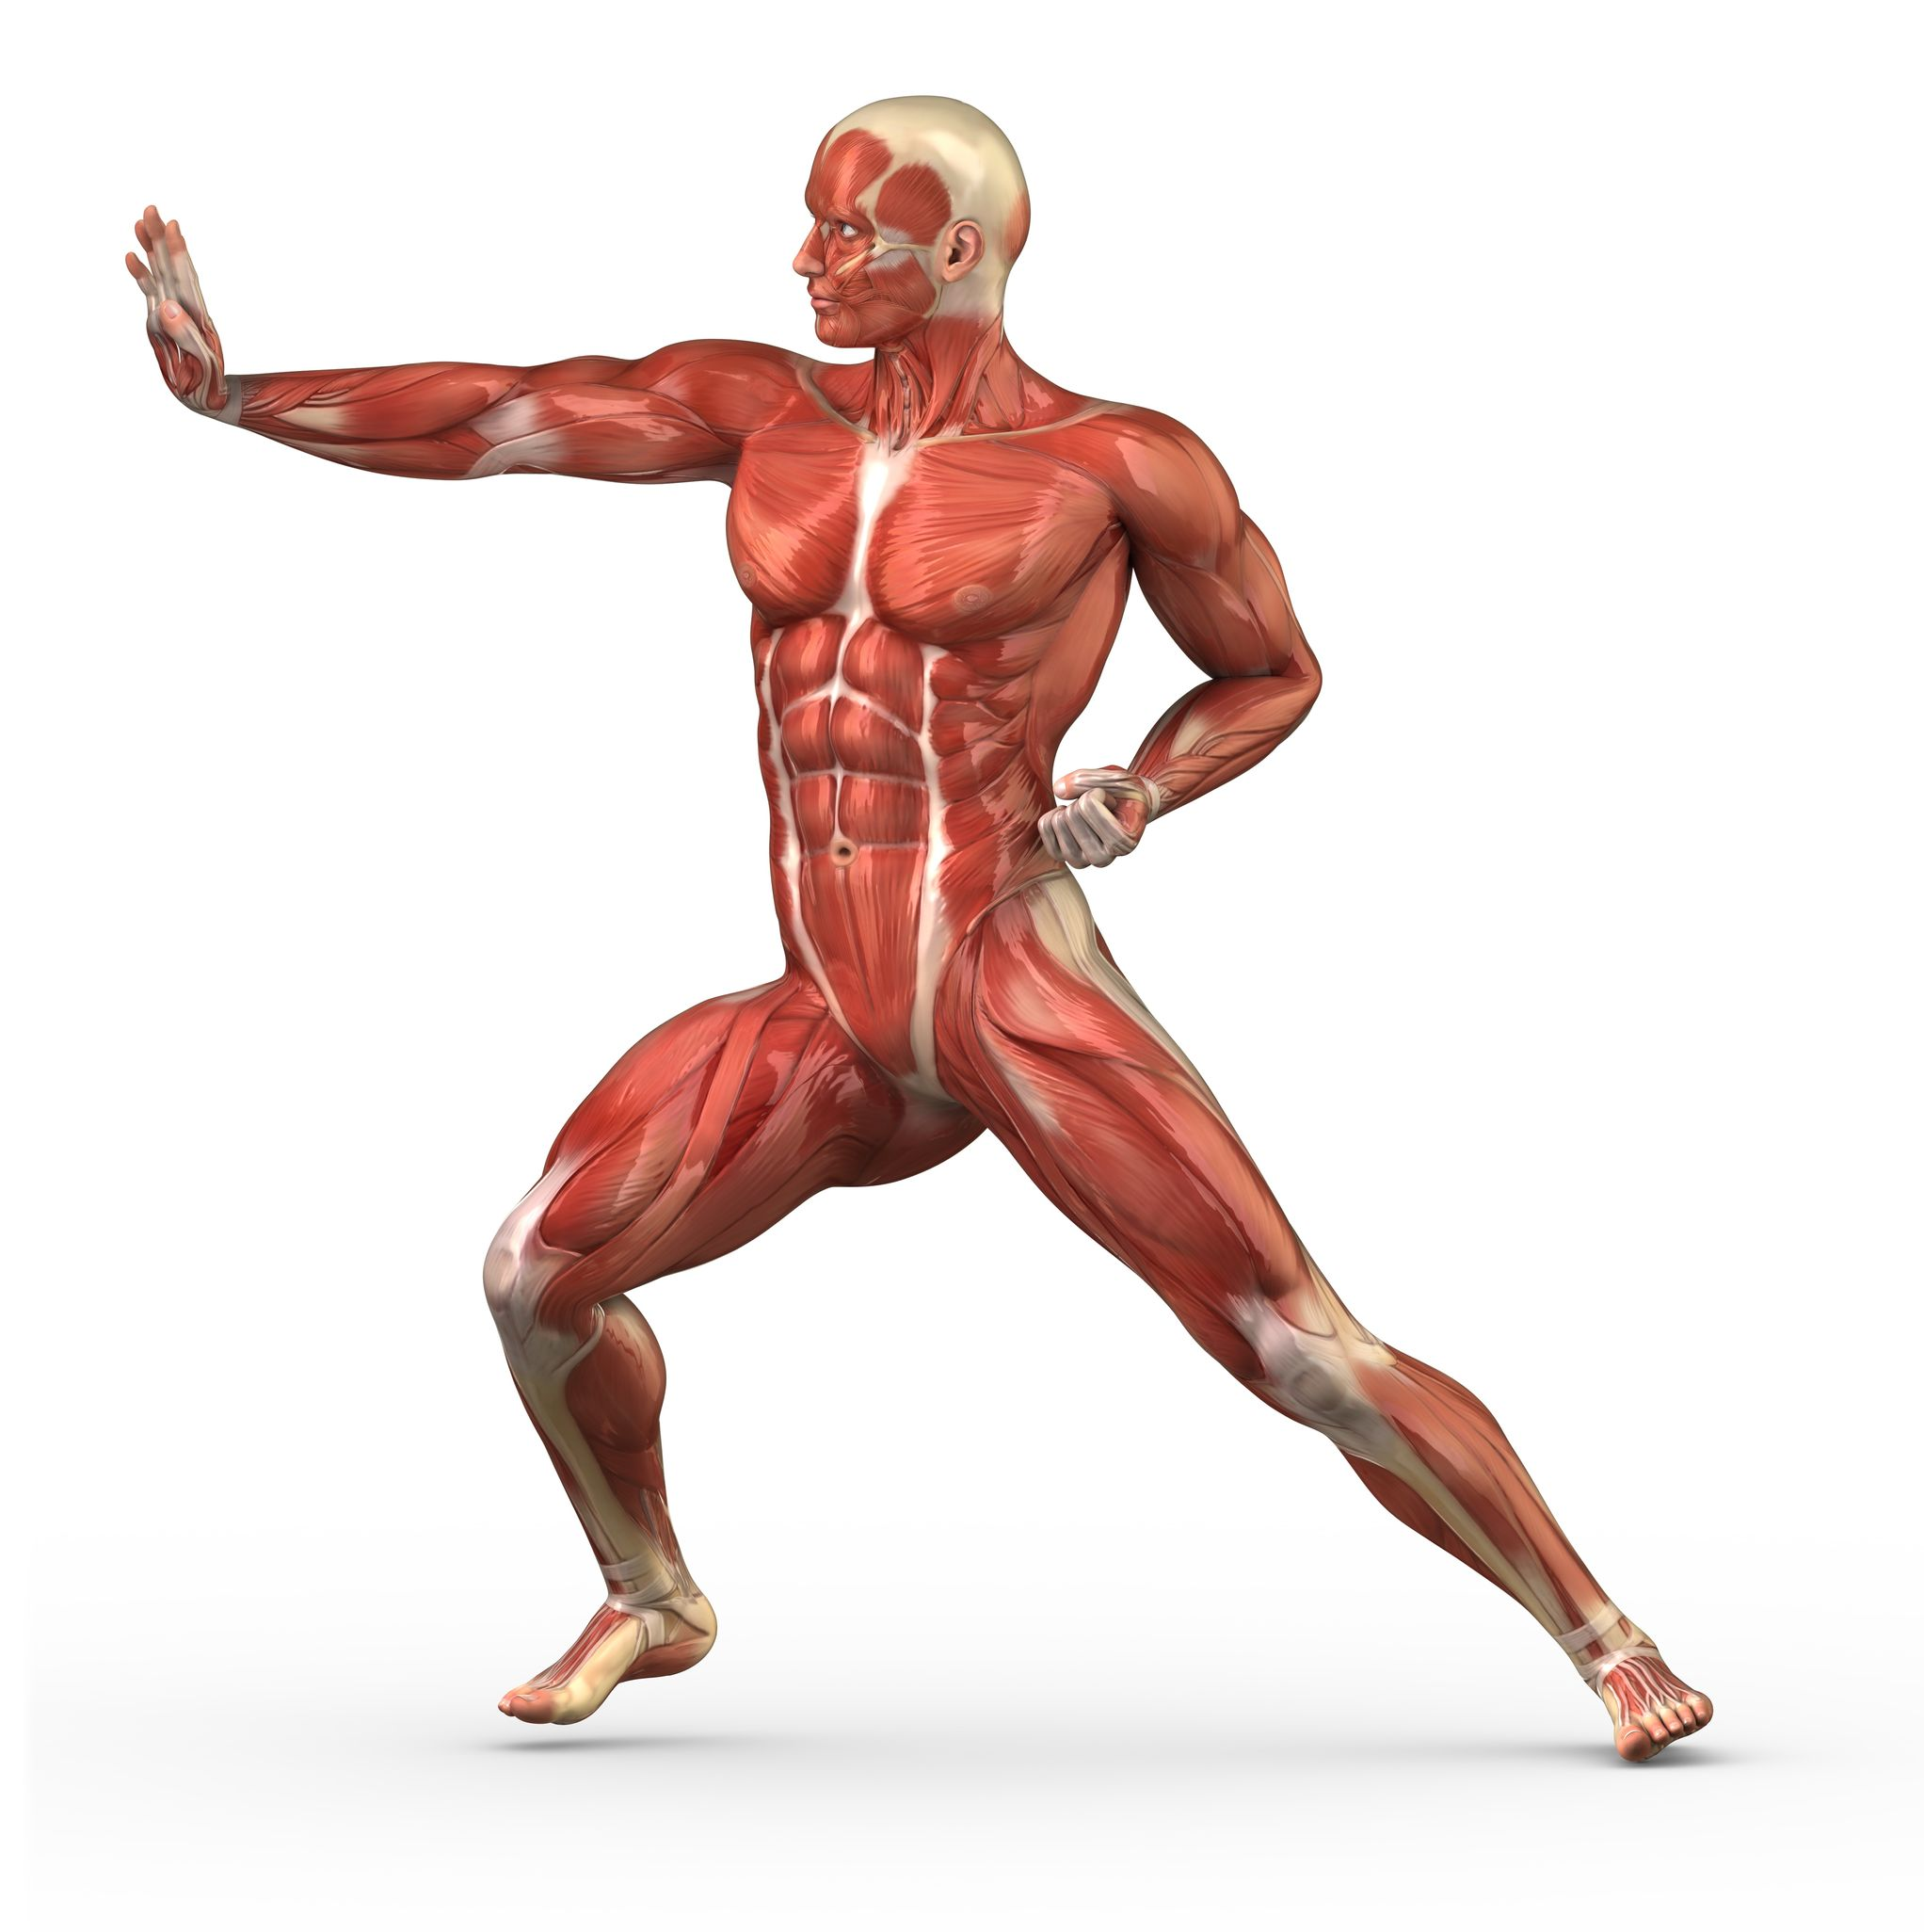 Human Male Muscle Anatomy Images - human body anatomy